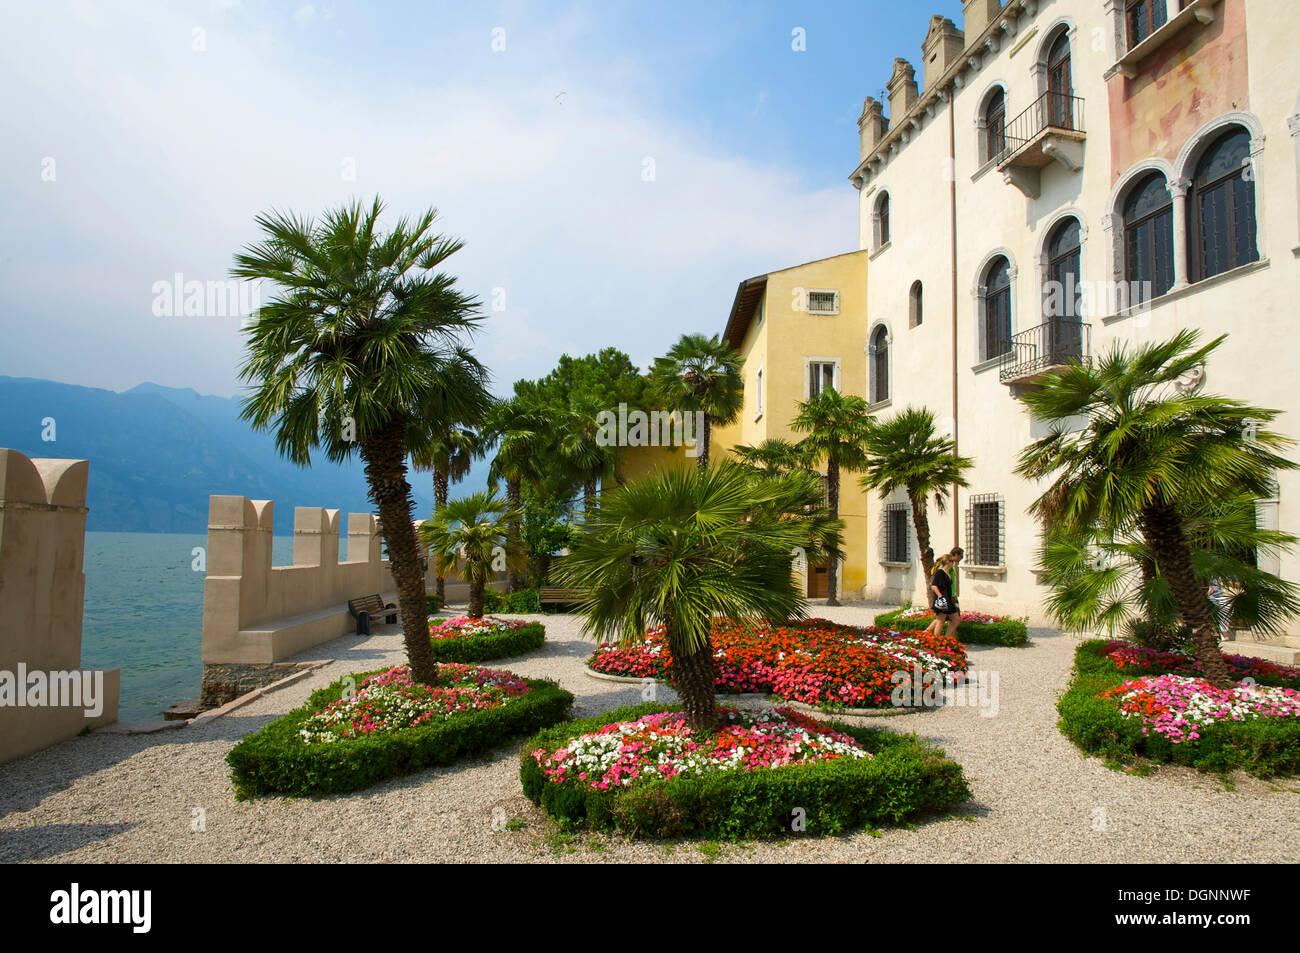 Garden of the Palazzo dei Capitani in Malcesine on Lake Garda, Veneto, Italy, Europe Stock Photo